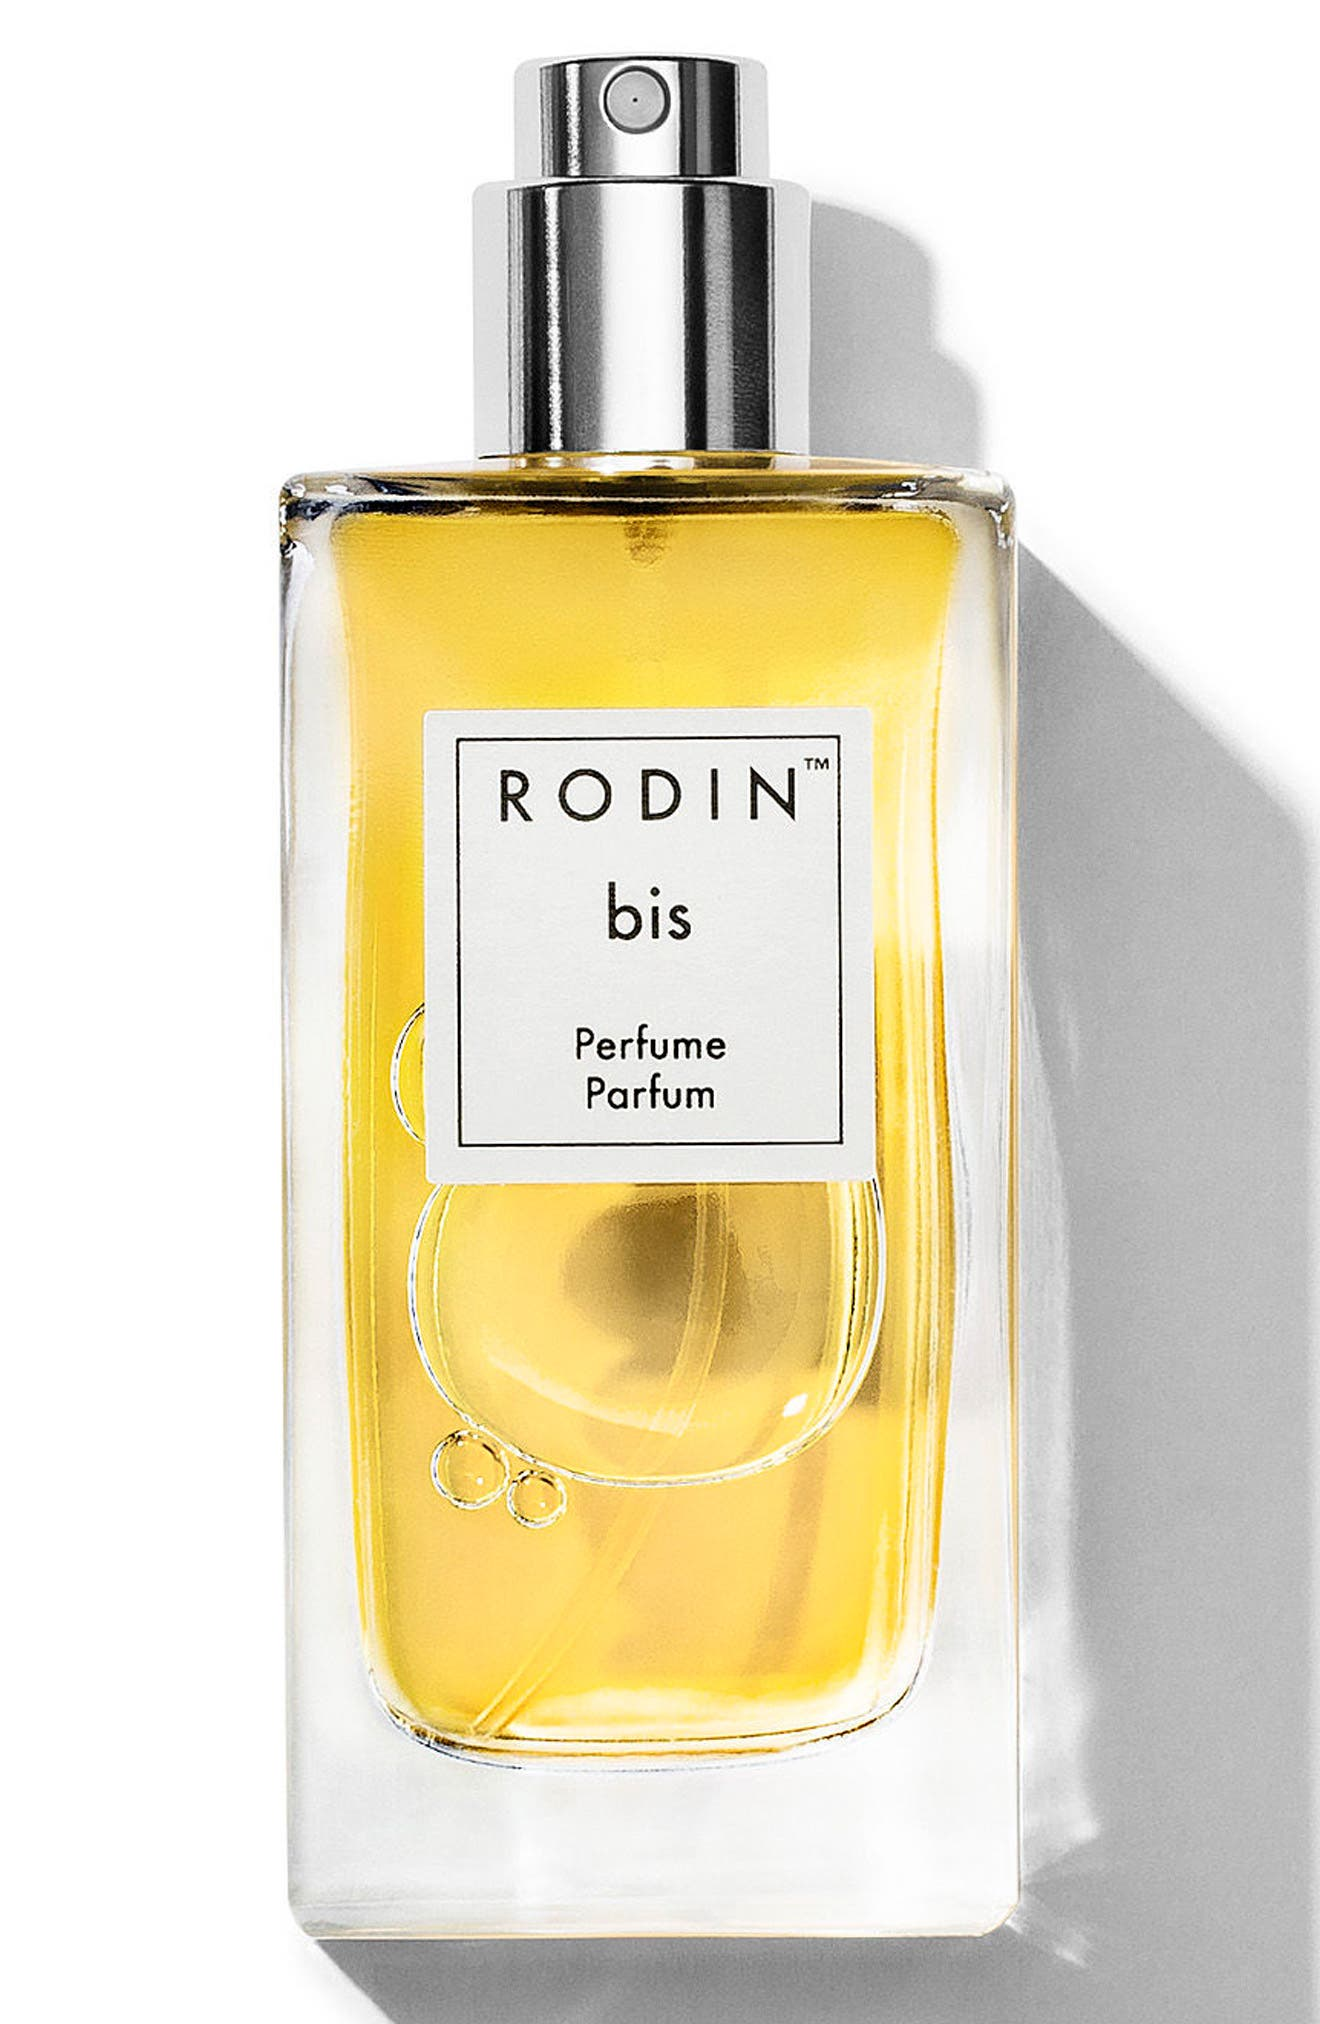 RODIN OLIO LUSSO,                             bis Perfume,                             Main thumbnail 1, color,                             NO COLOR